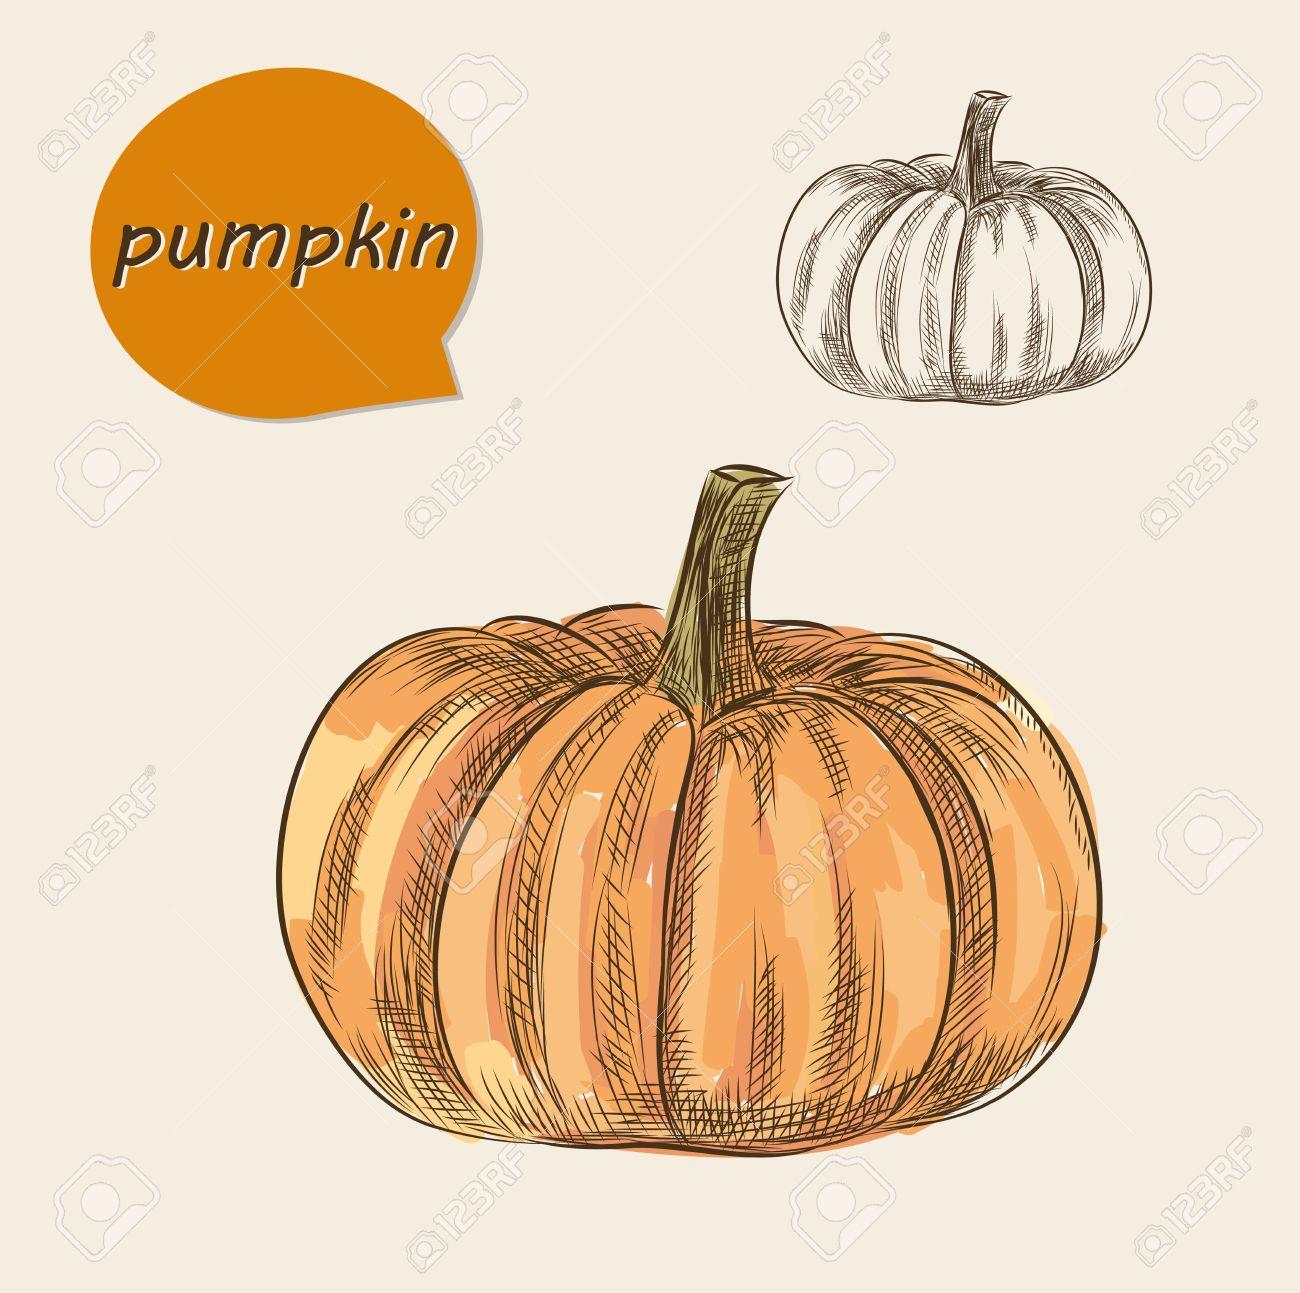 realistic pumpkin drawing. pumpkin. realistic sketch. draw by wacom cintiq stock vector - 34856392 pumpkin drawing